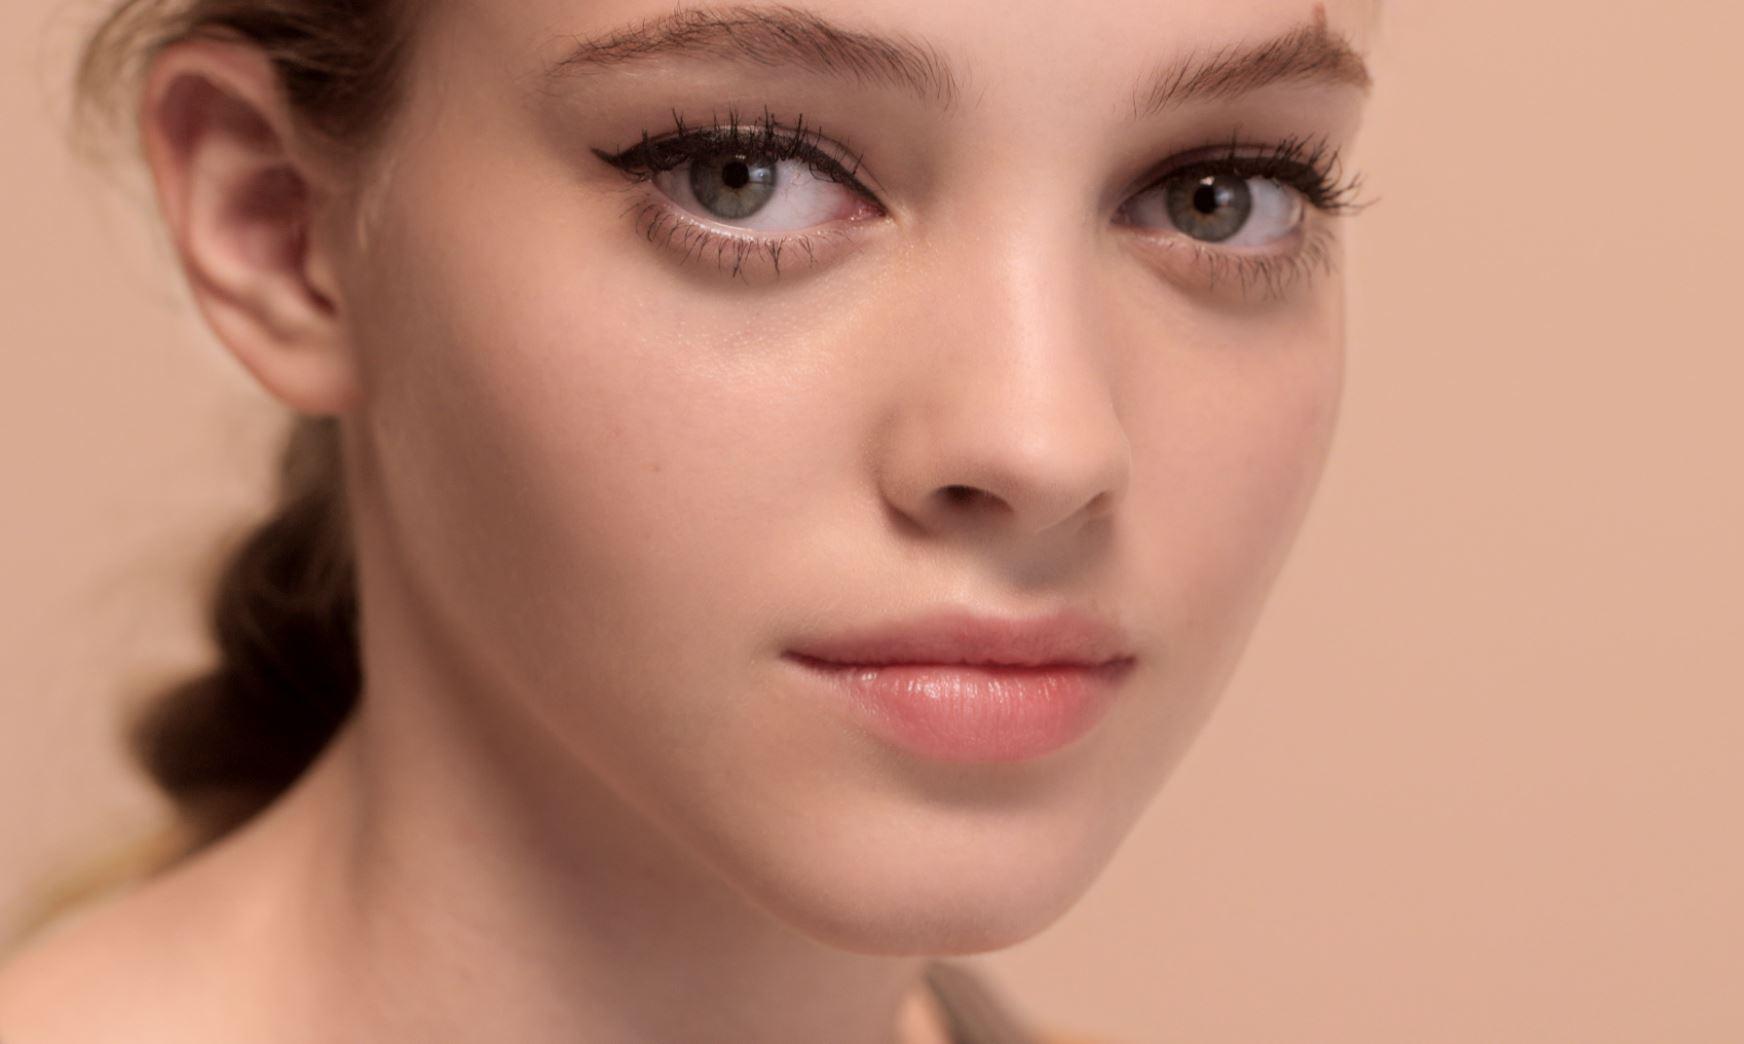 Master winged eyeliner with the latest episode of Vogue Beauty School - https://t.co/UkZh4pwaet https://t.co/ym1Eunj1yC